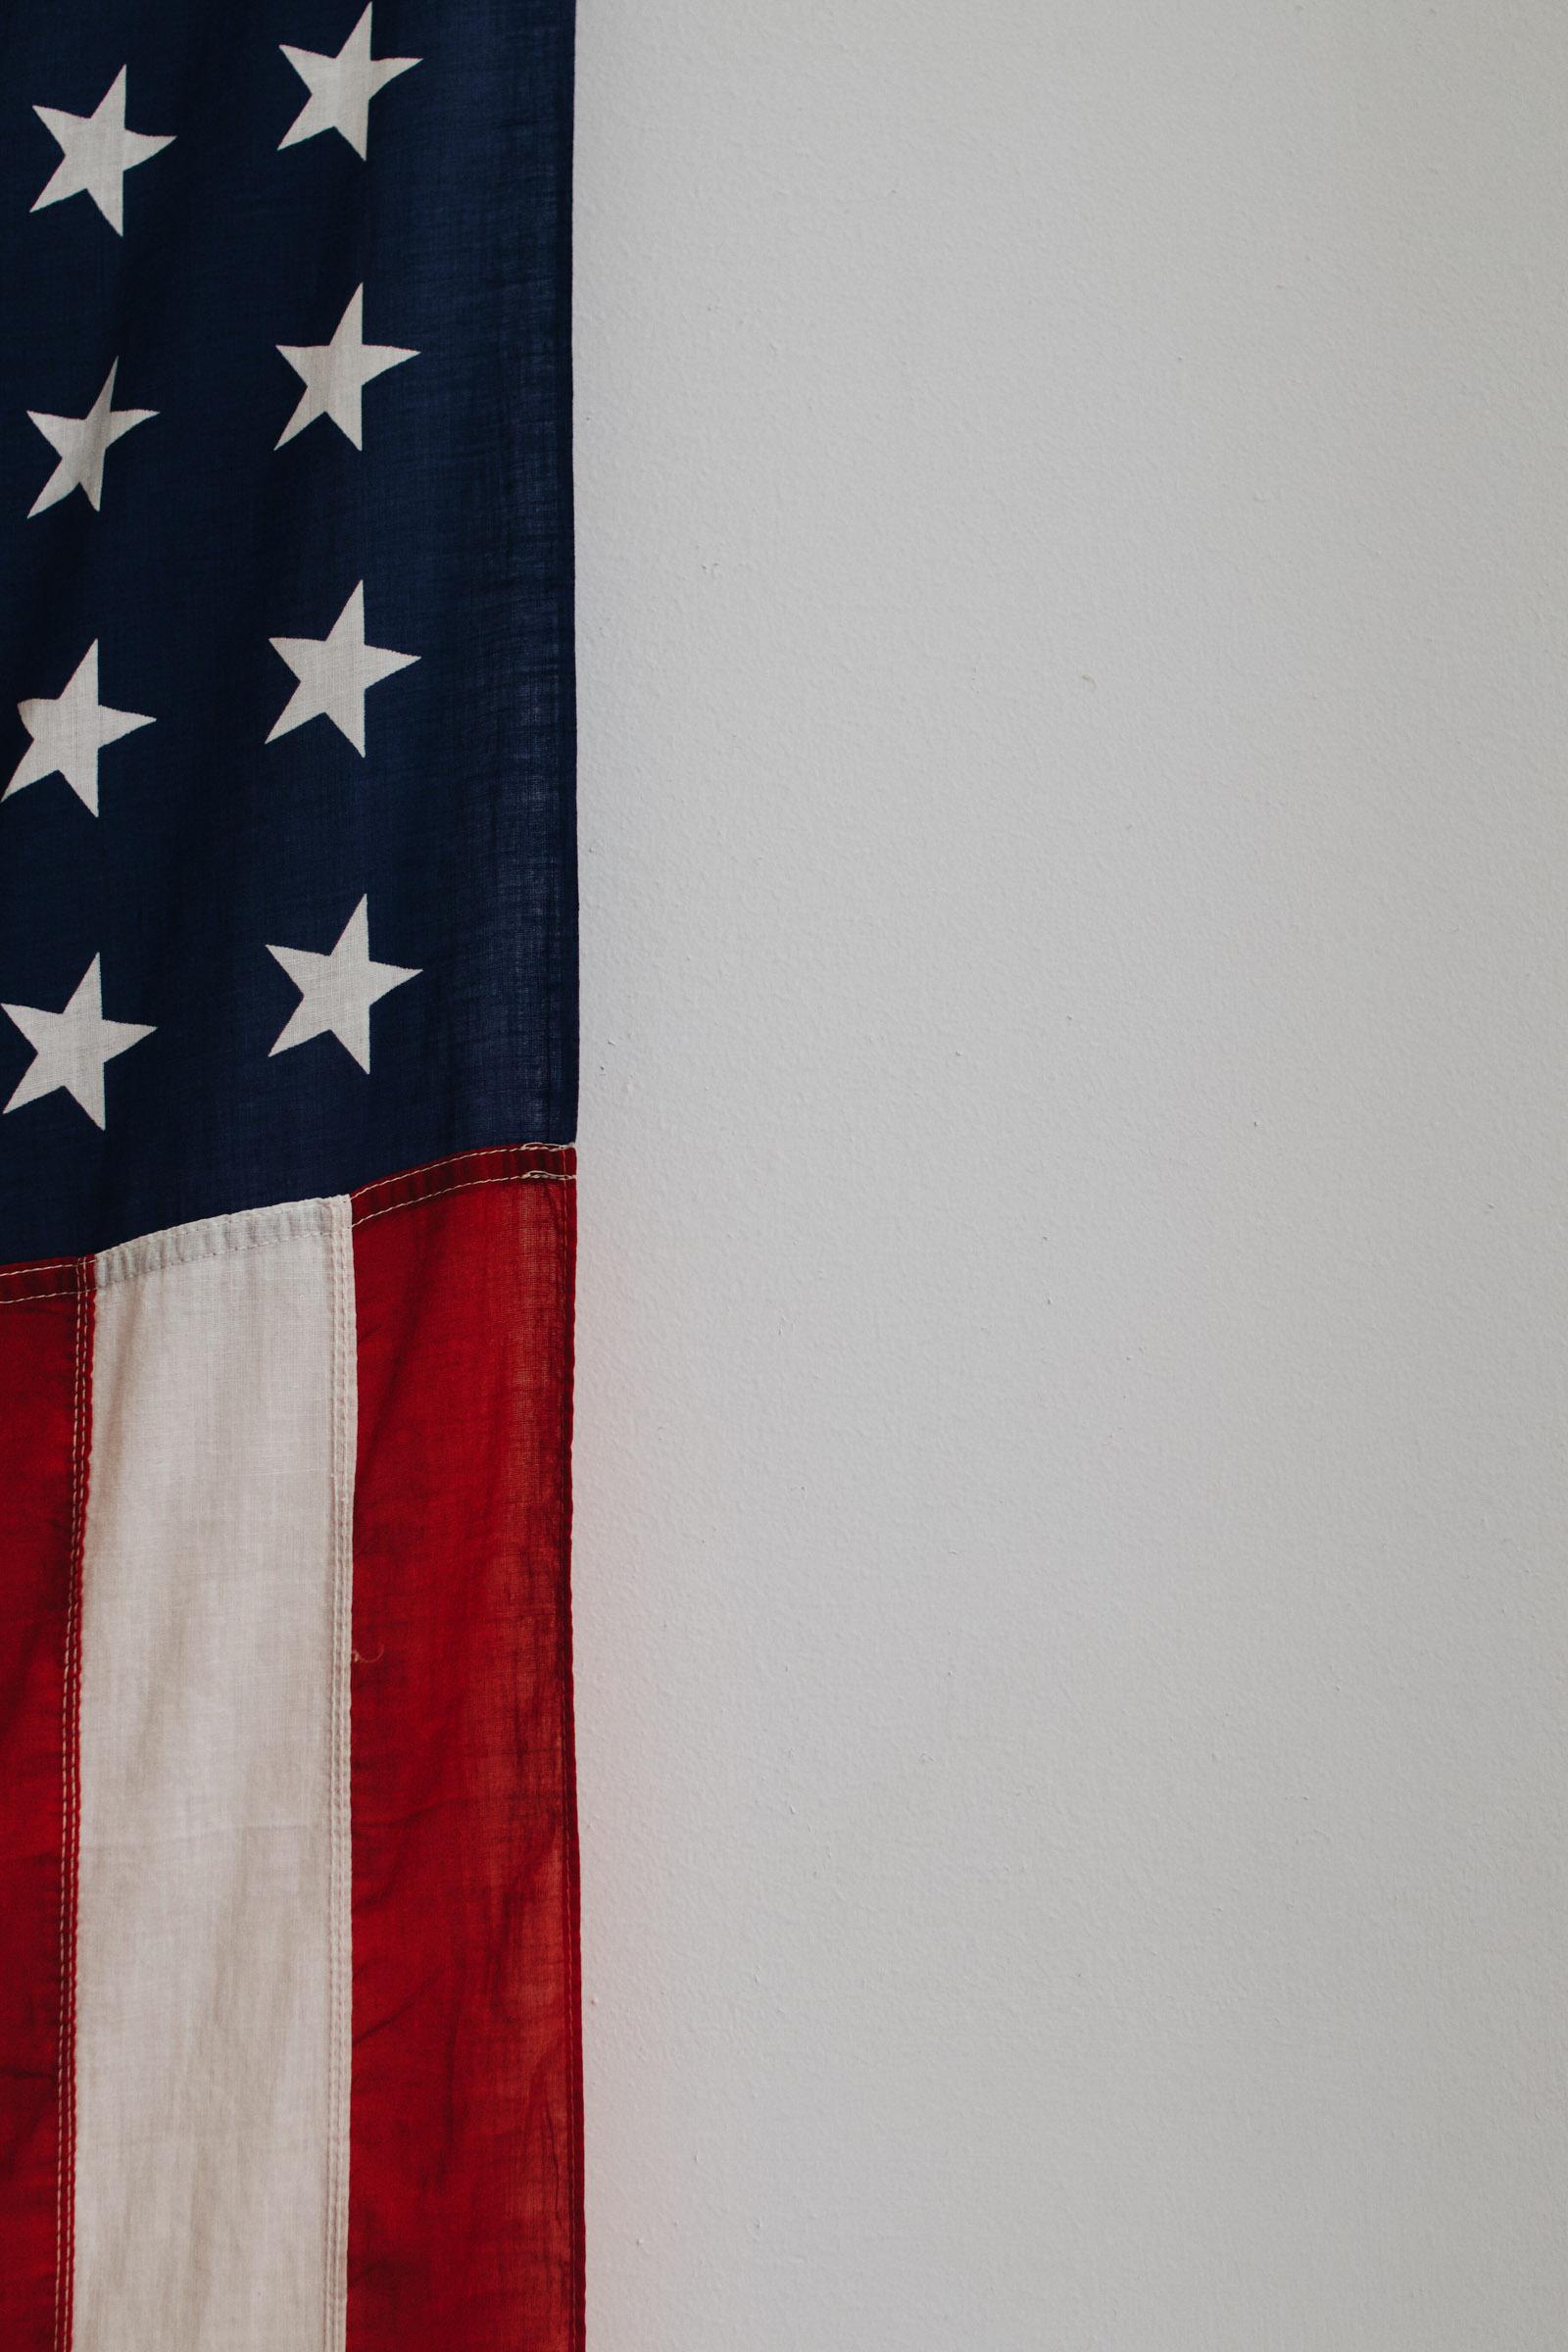 american flag brianna santellan 721479 unsplash